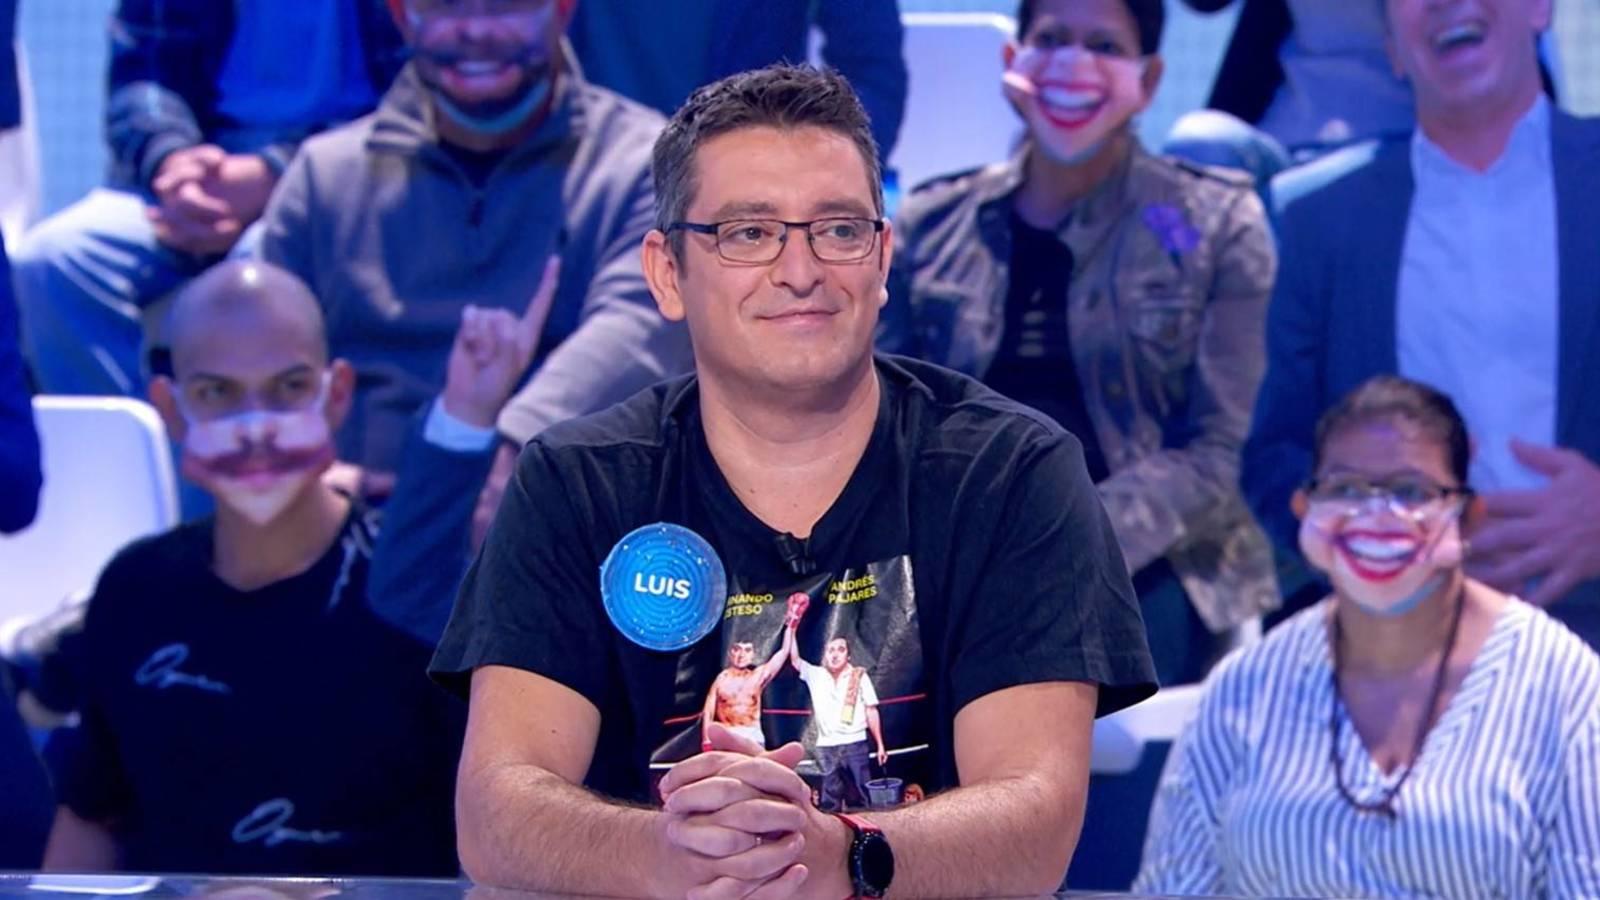 Luis Boom